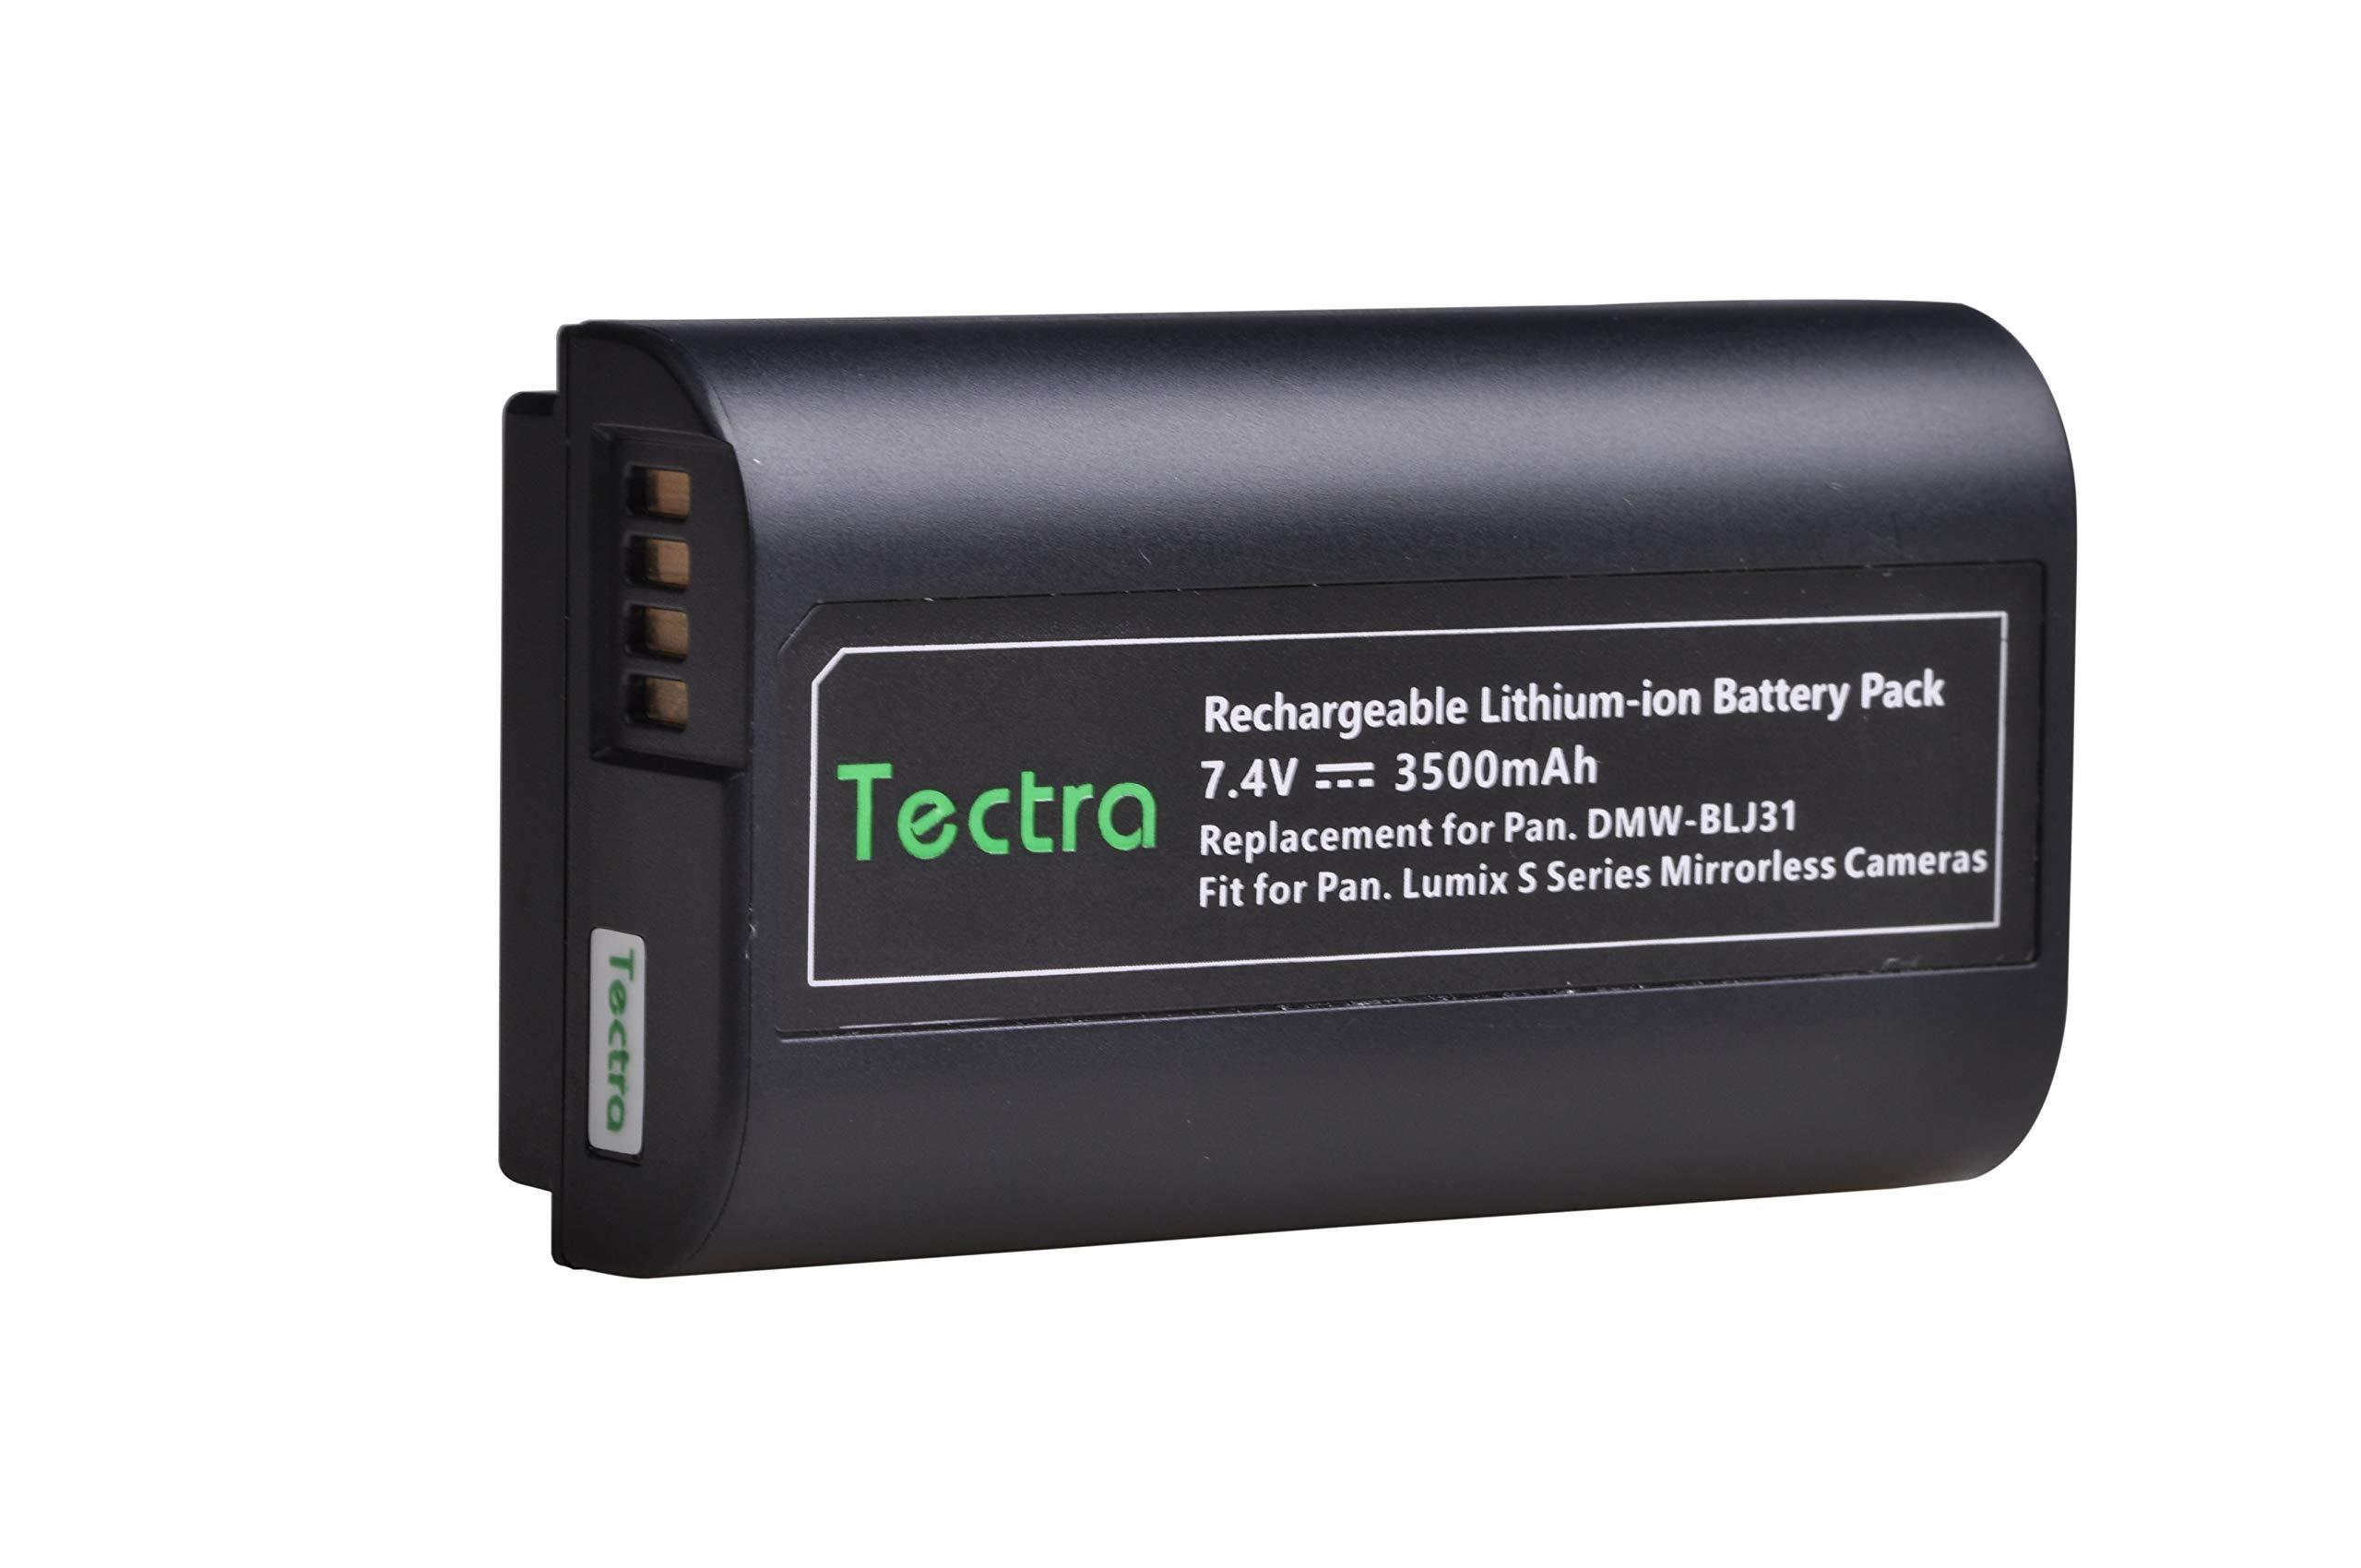 Tectra 7.4V 3500mAh DMW-BLJ31 Replacement Battery for Panasonic LUMIX S1, S1R,S1H, Panasonic LUMIX S Series Mirrorless Cameras by Tectra